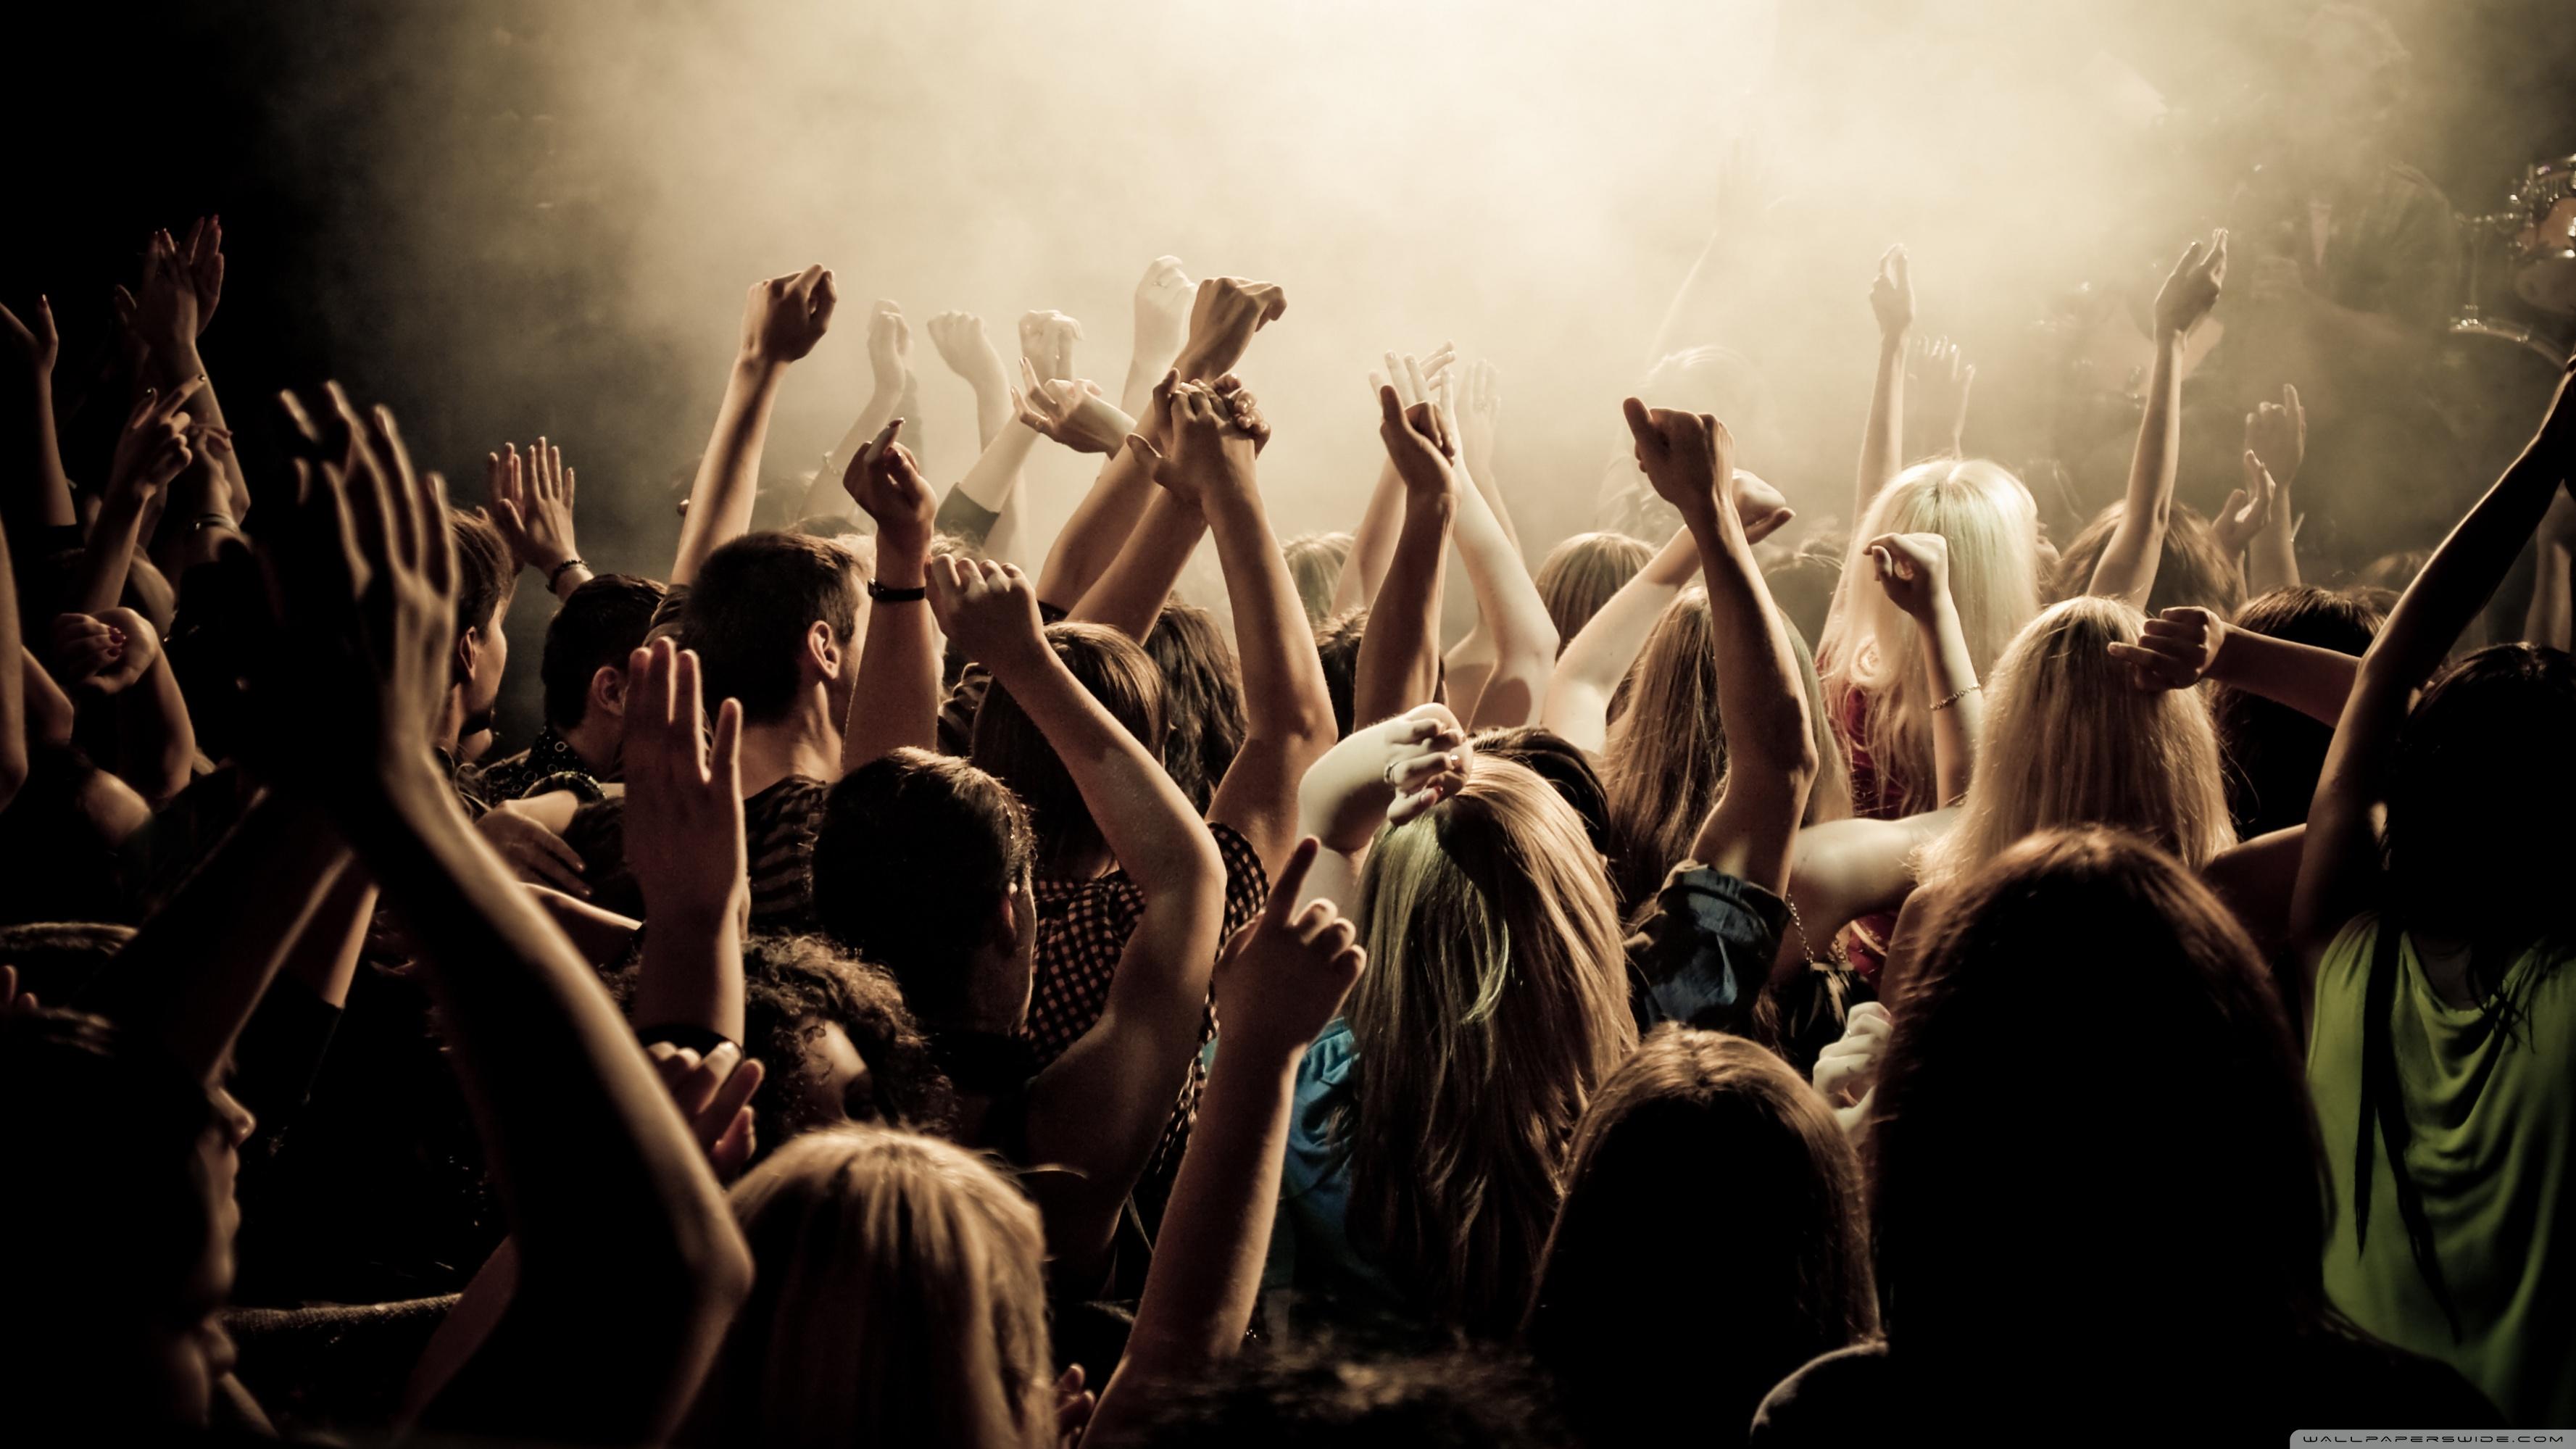 concert_crowd-wallpaper-3554x1999